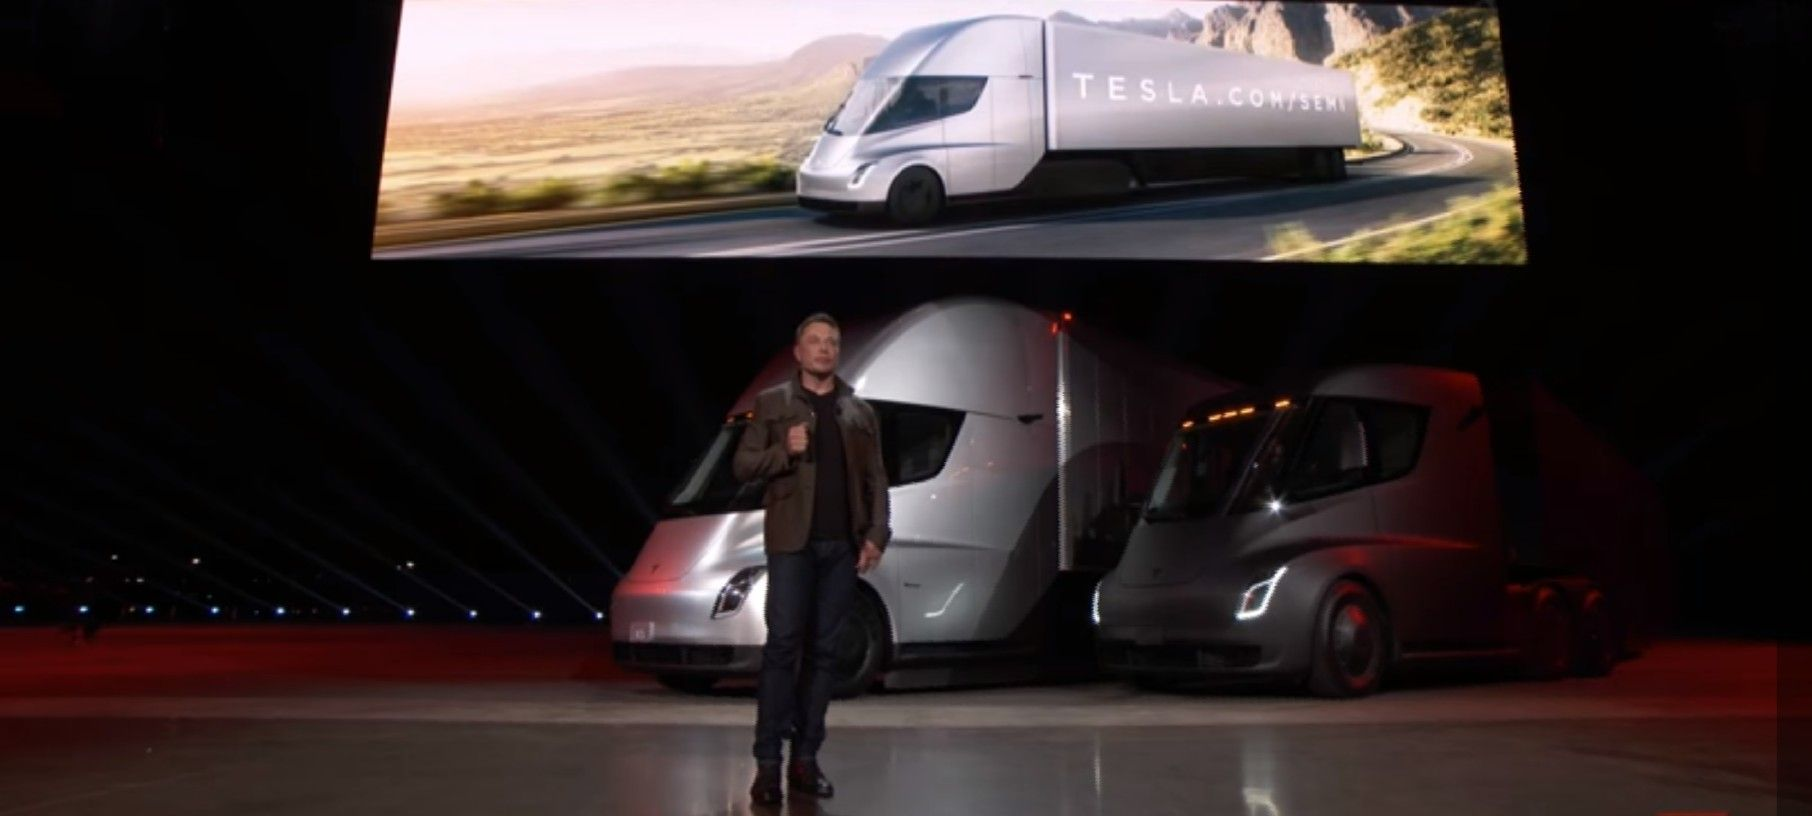 Pin By D Macke On Tesla And Evs Tesla Semi Trucks Electric Semi Truck